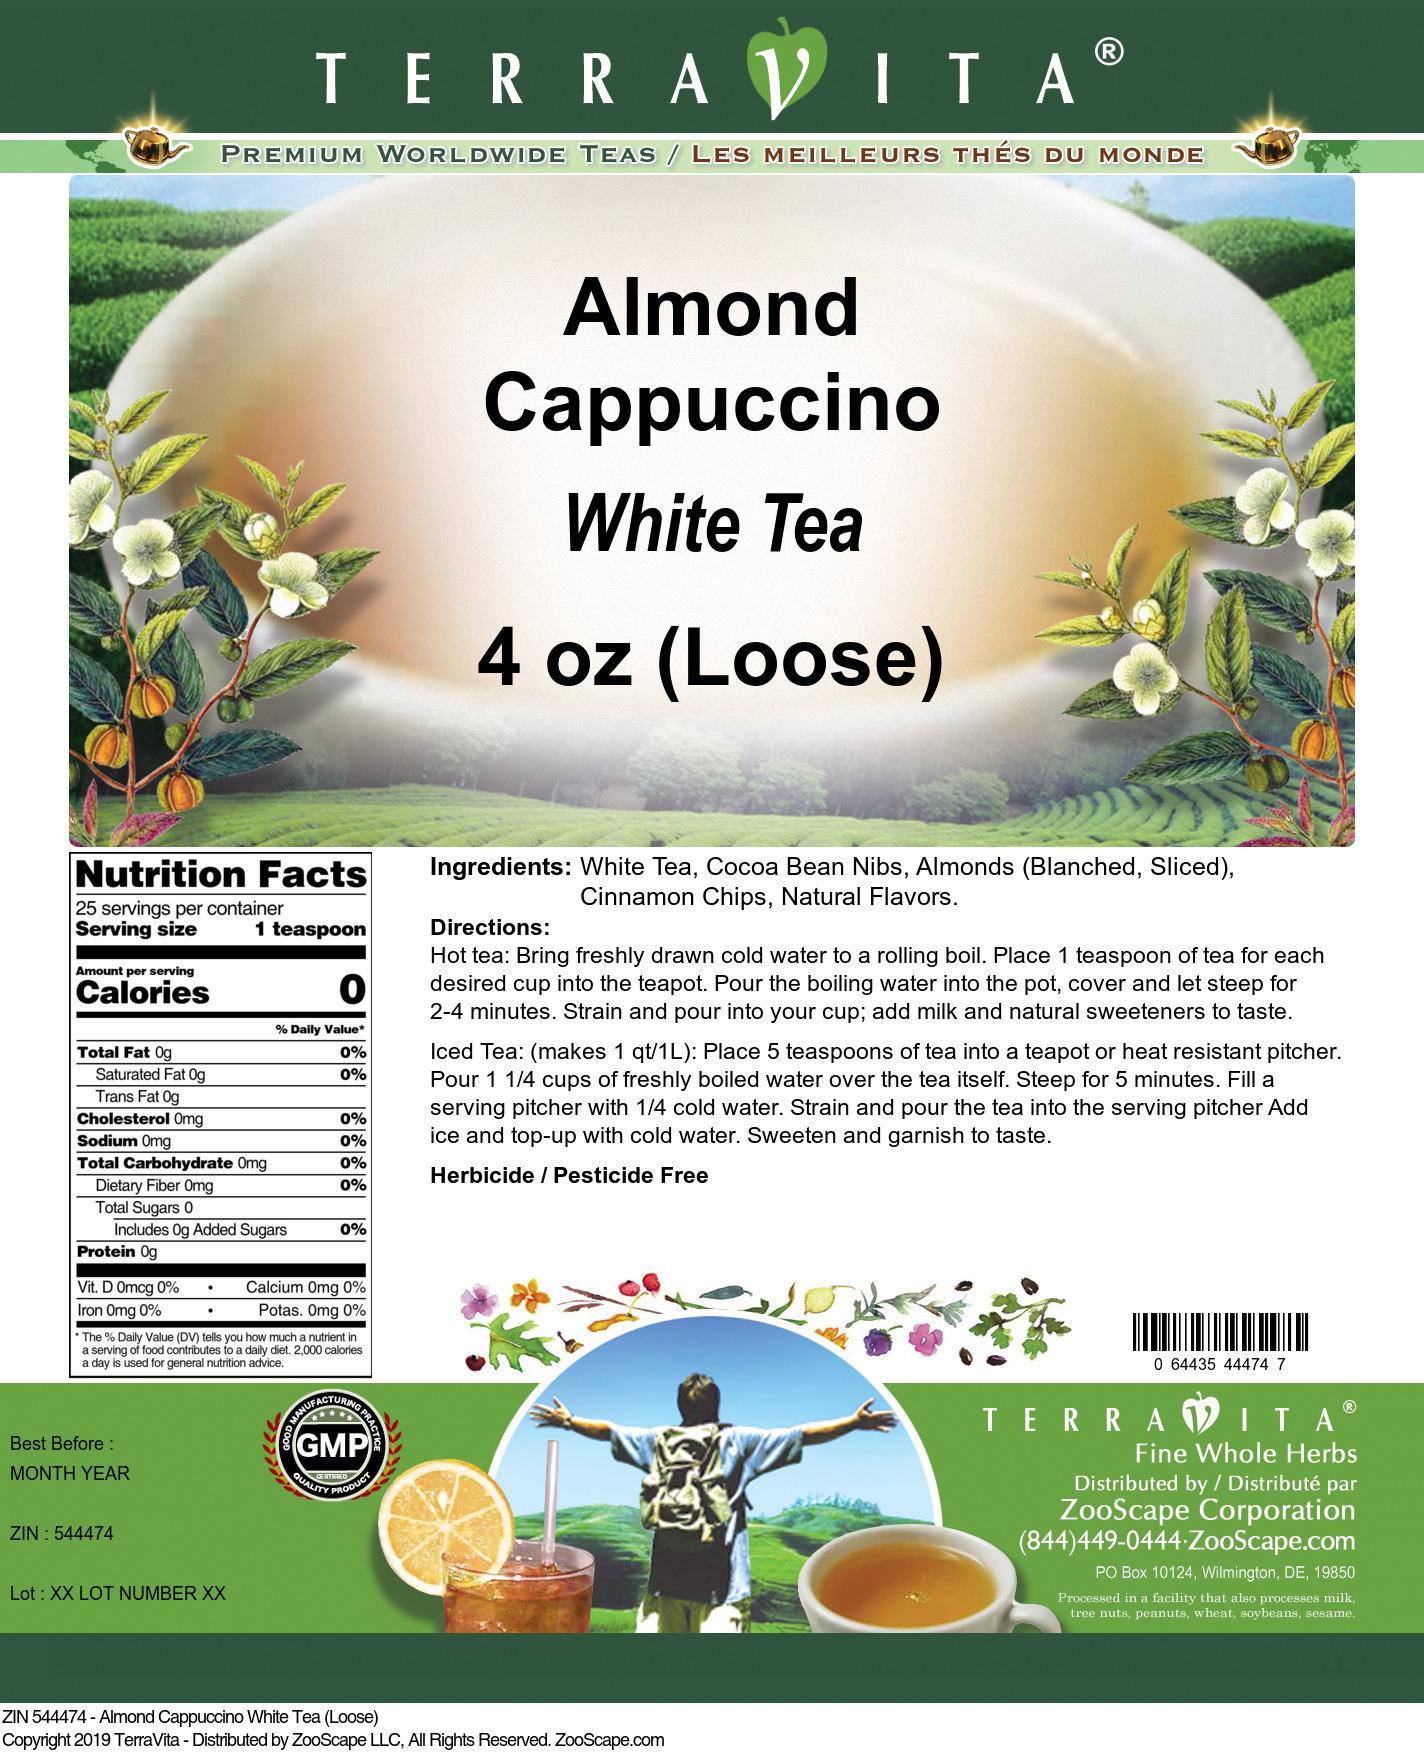 Almond Cappuccino White Tea (Loose)